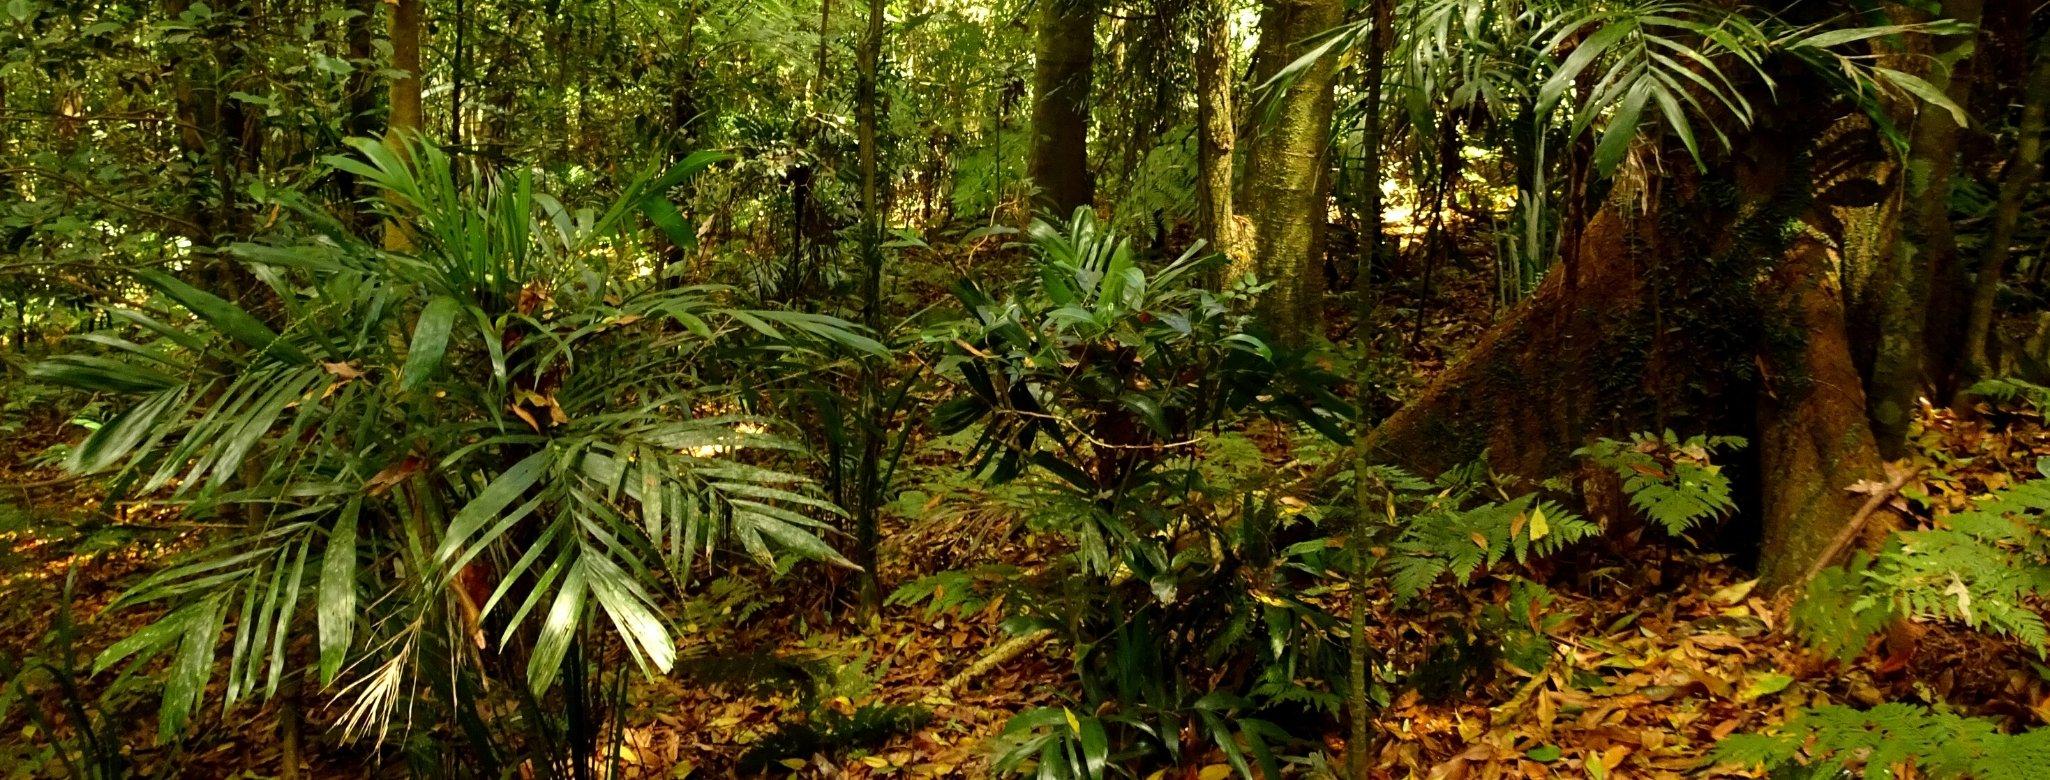 Gondwana Rainforest Dorrigo, Bellingen Shire, New South Wales